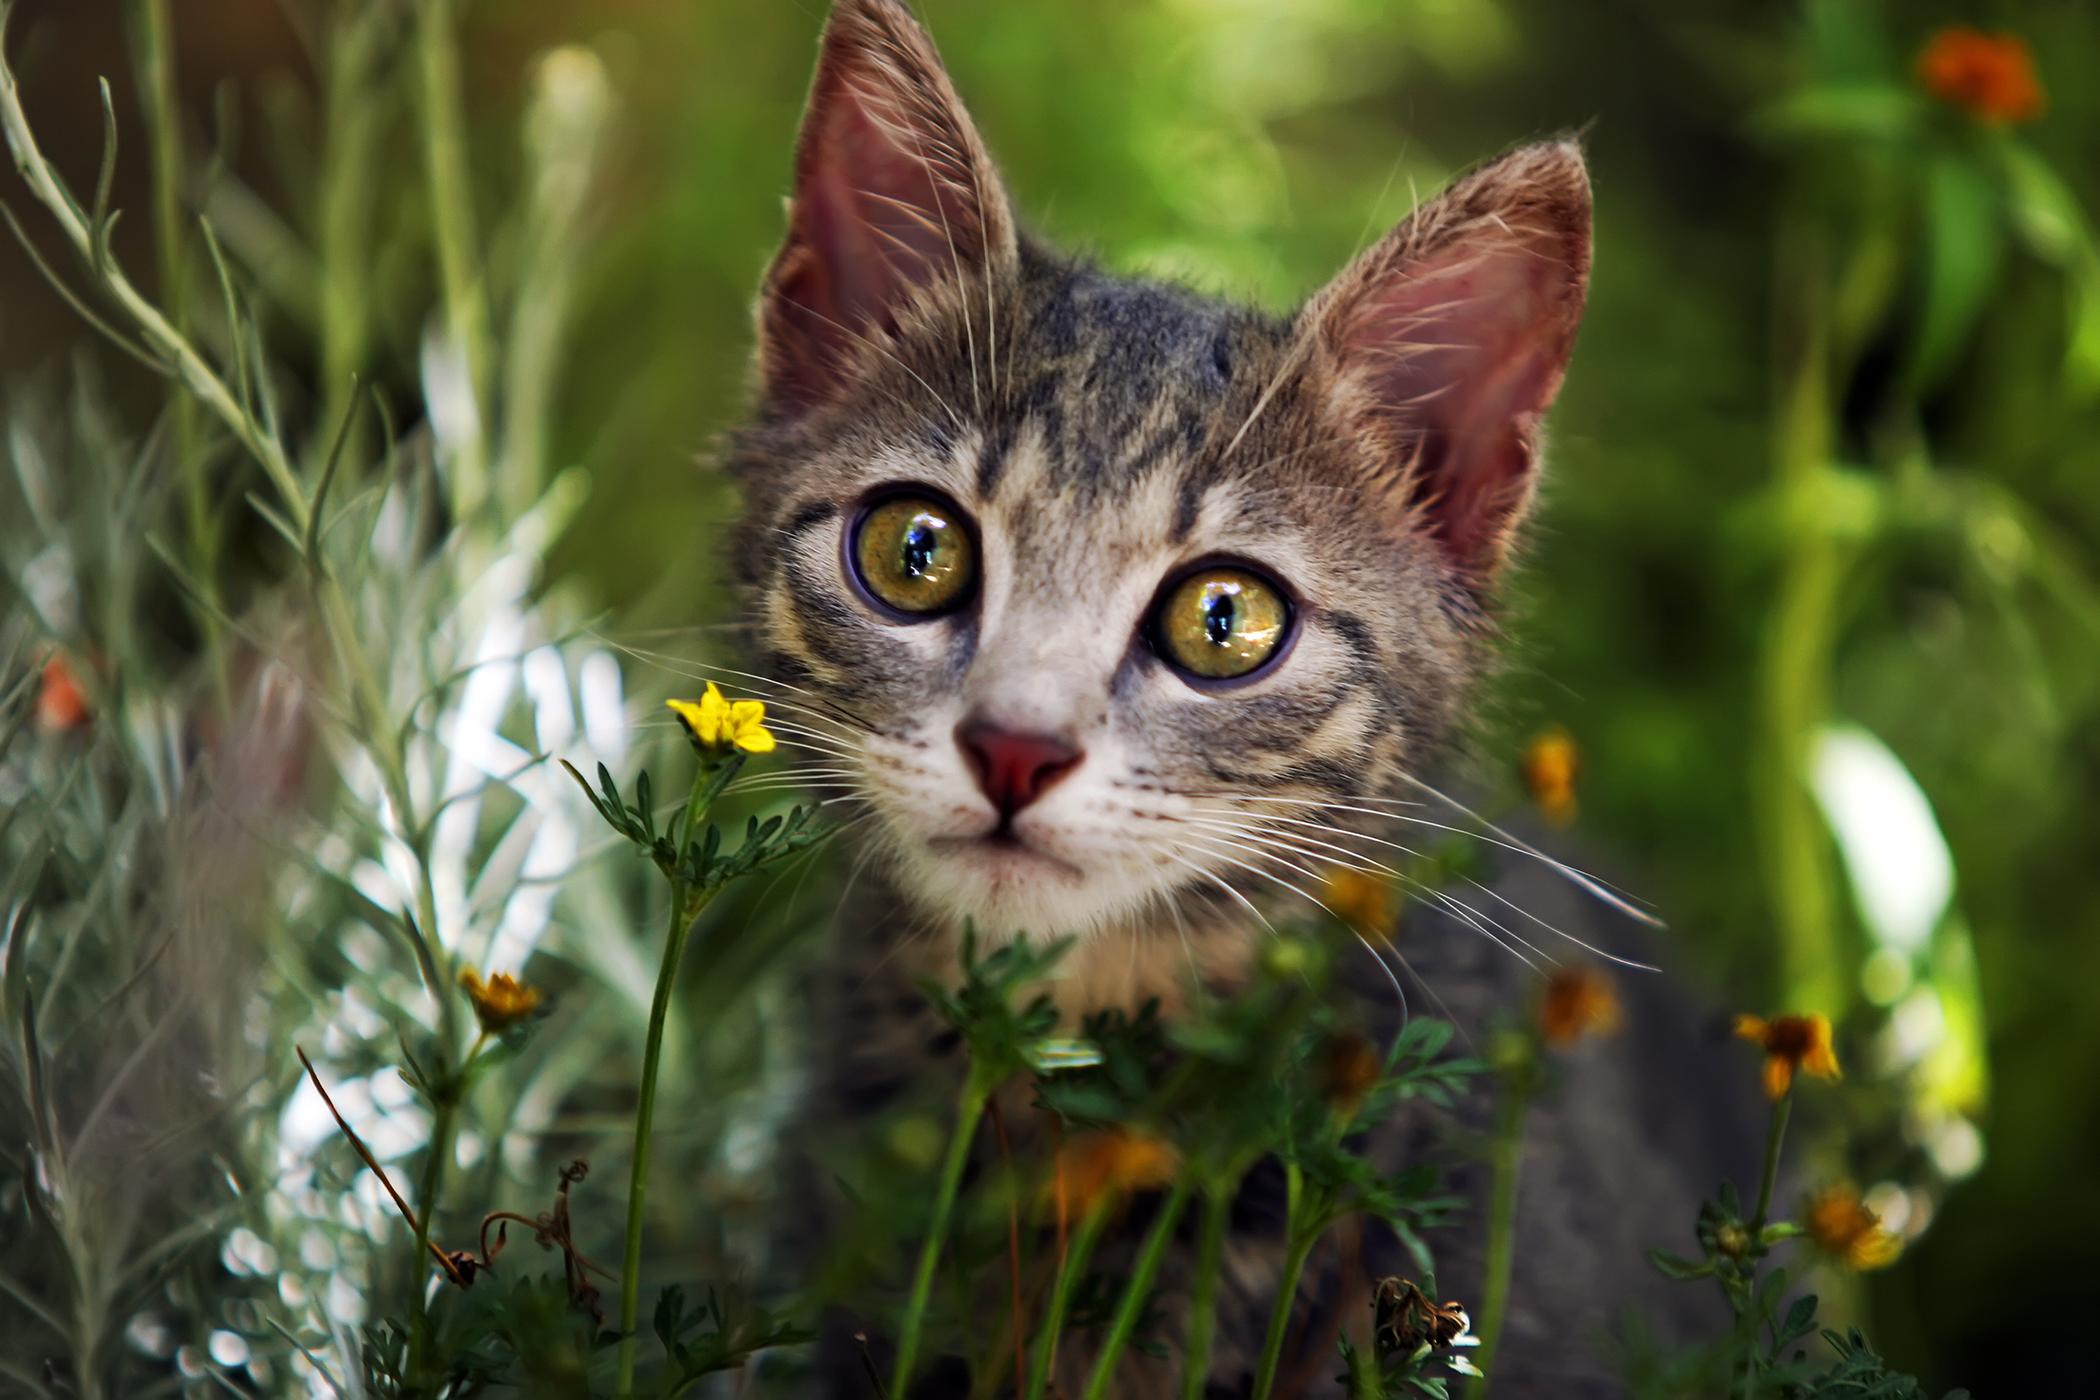 Methimazole Allergy in Cats